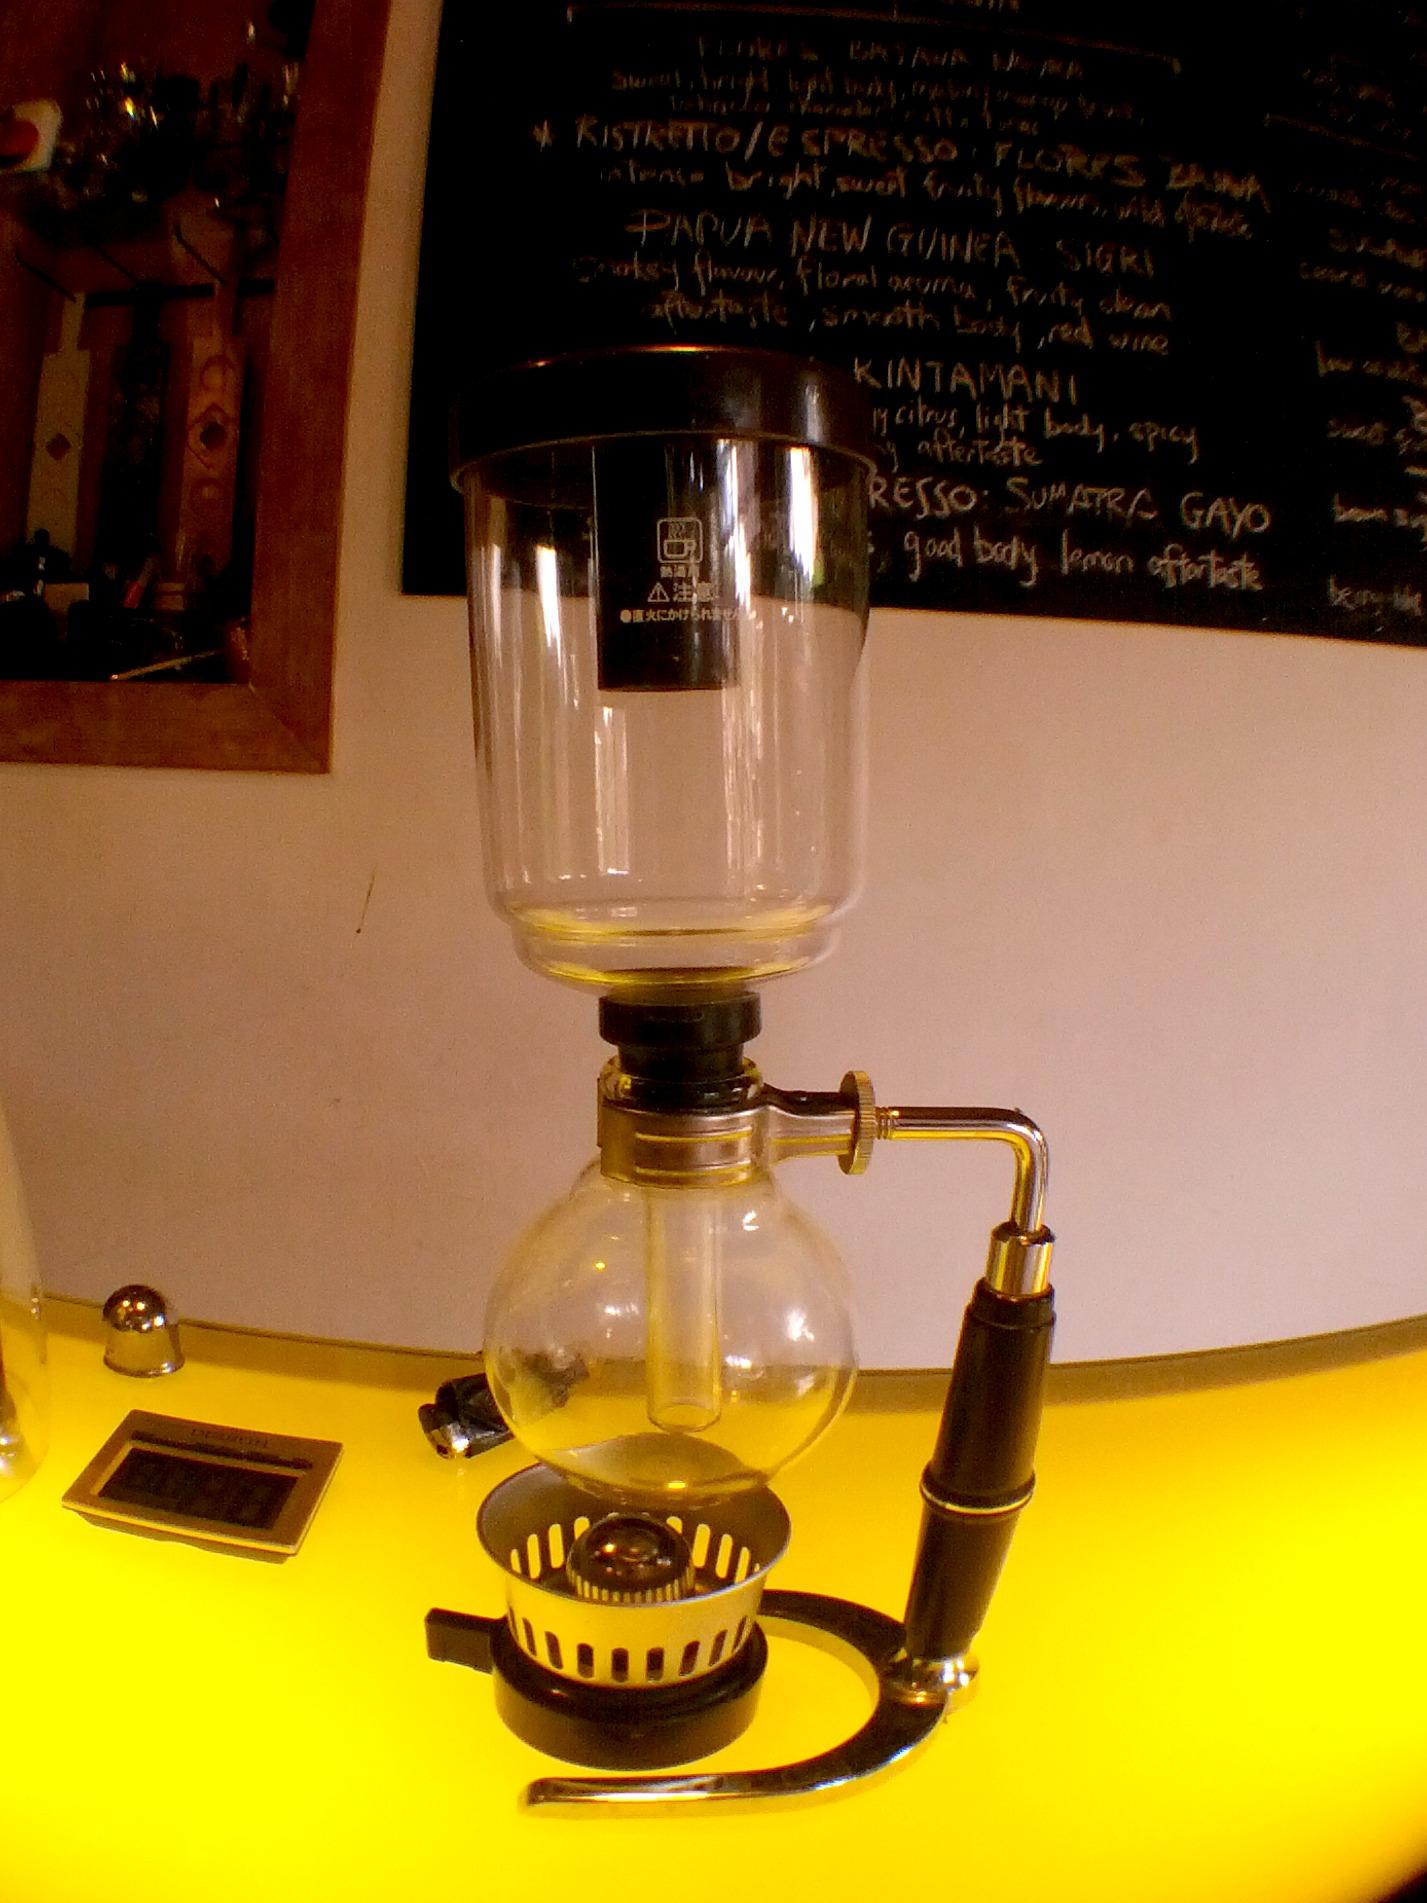 Starbucks Siphon Coffee Maker : Ubud in One Day My Way Sharon Travelogue